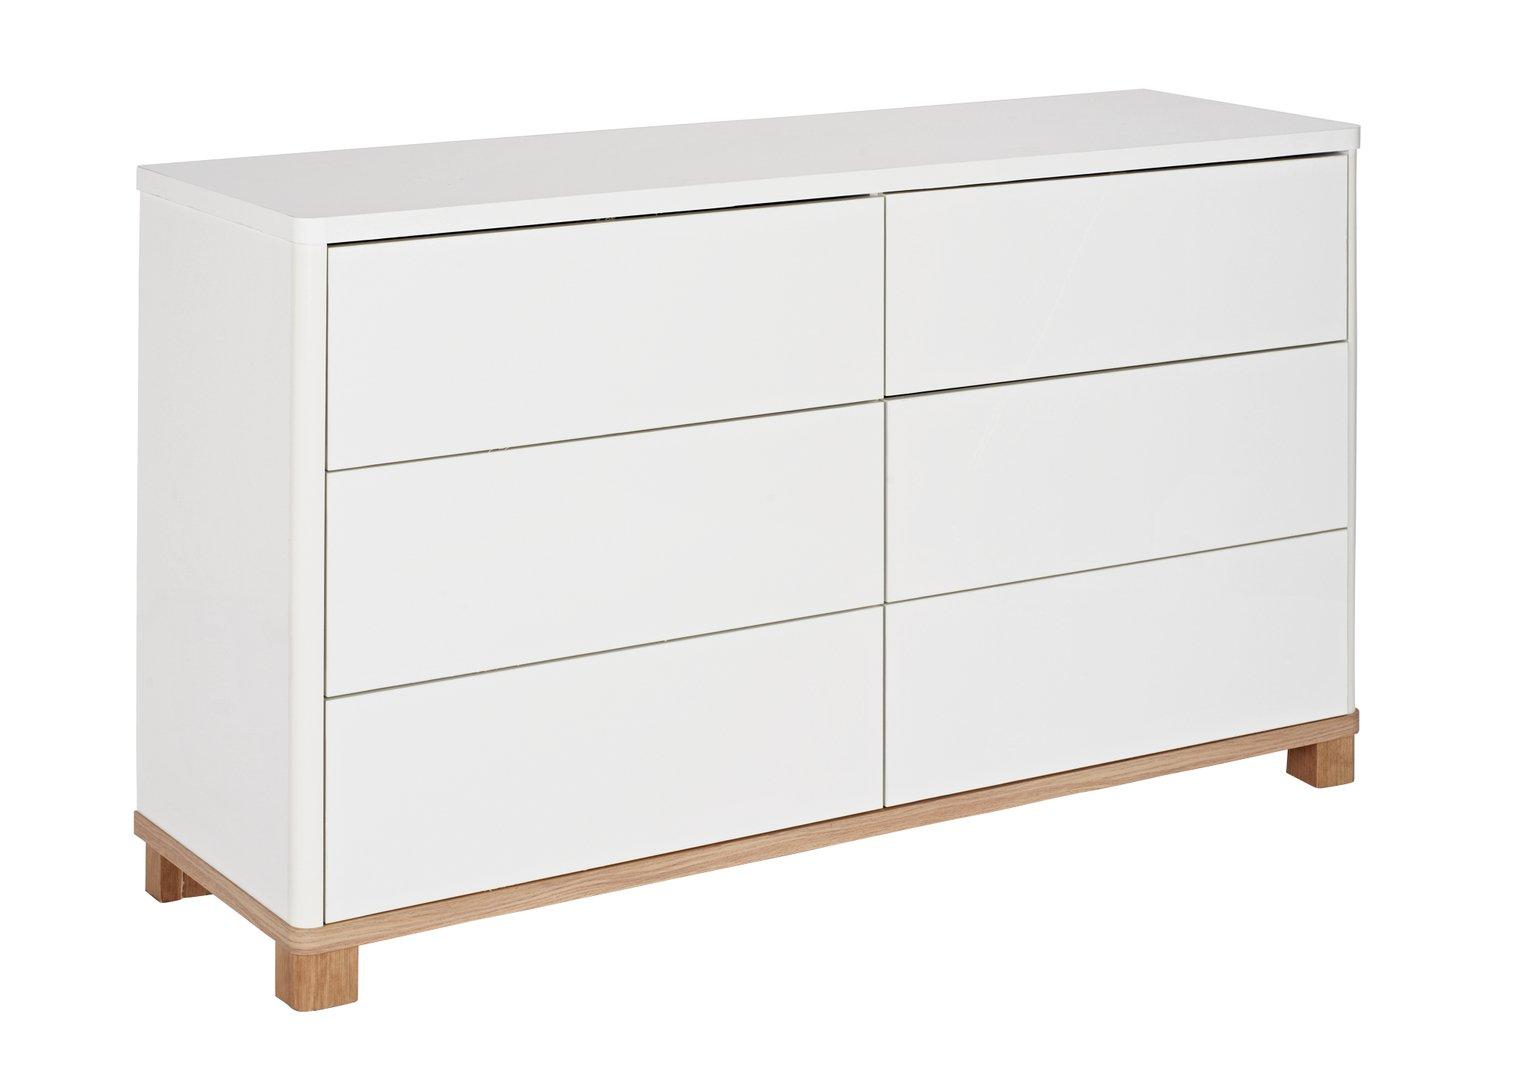 Hygena Finn 3+3 Drawer Chest - White Gloss